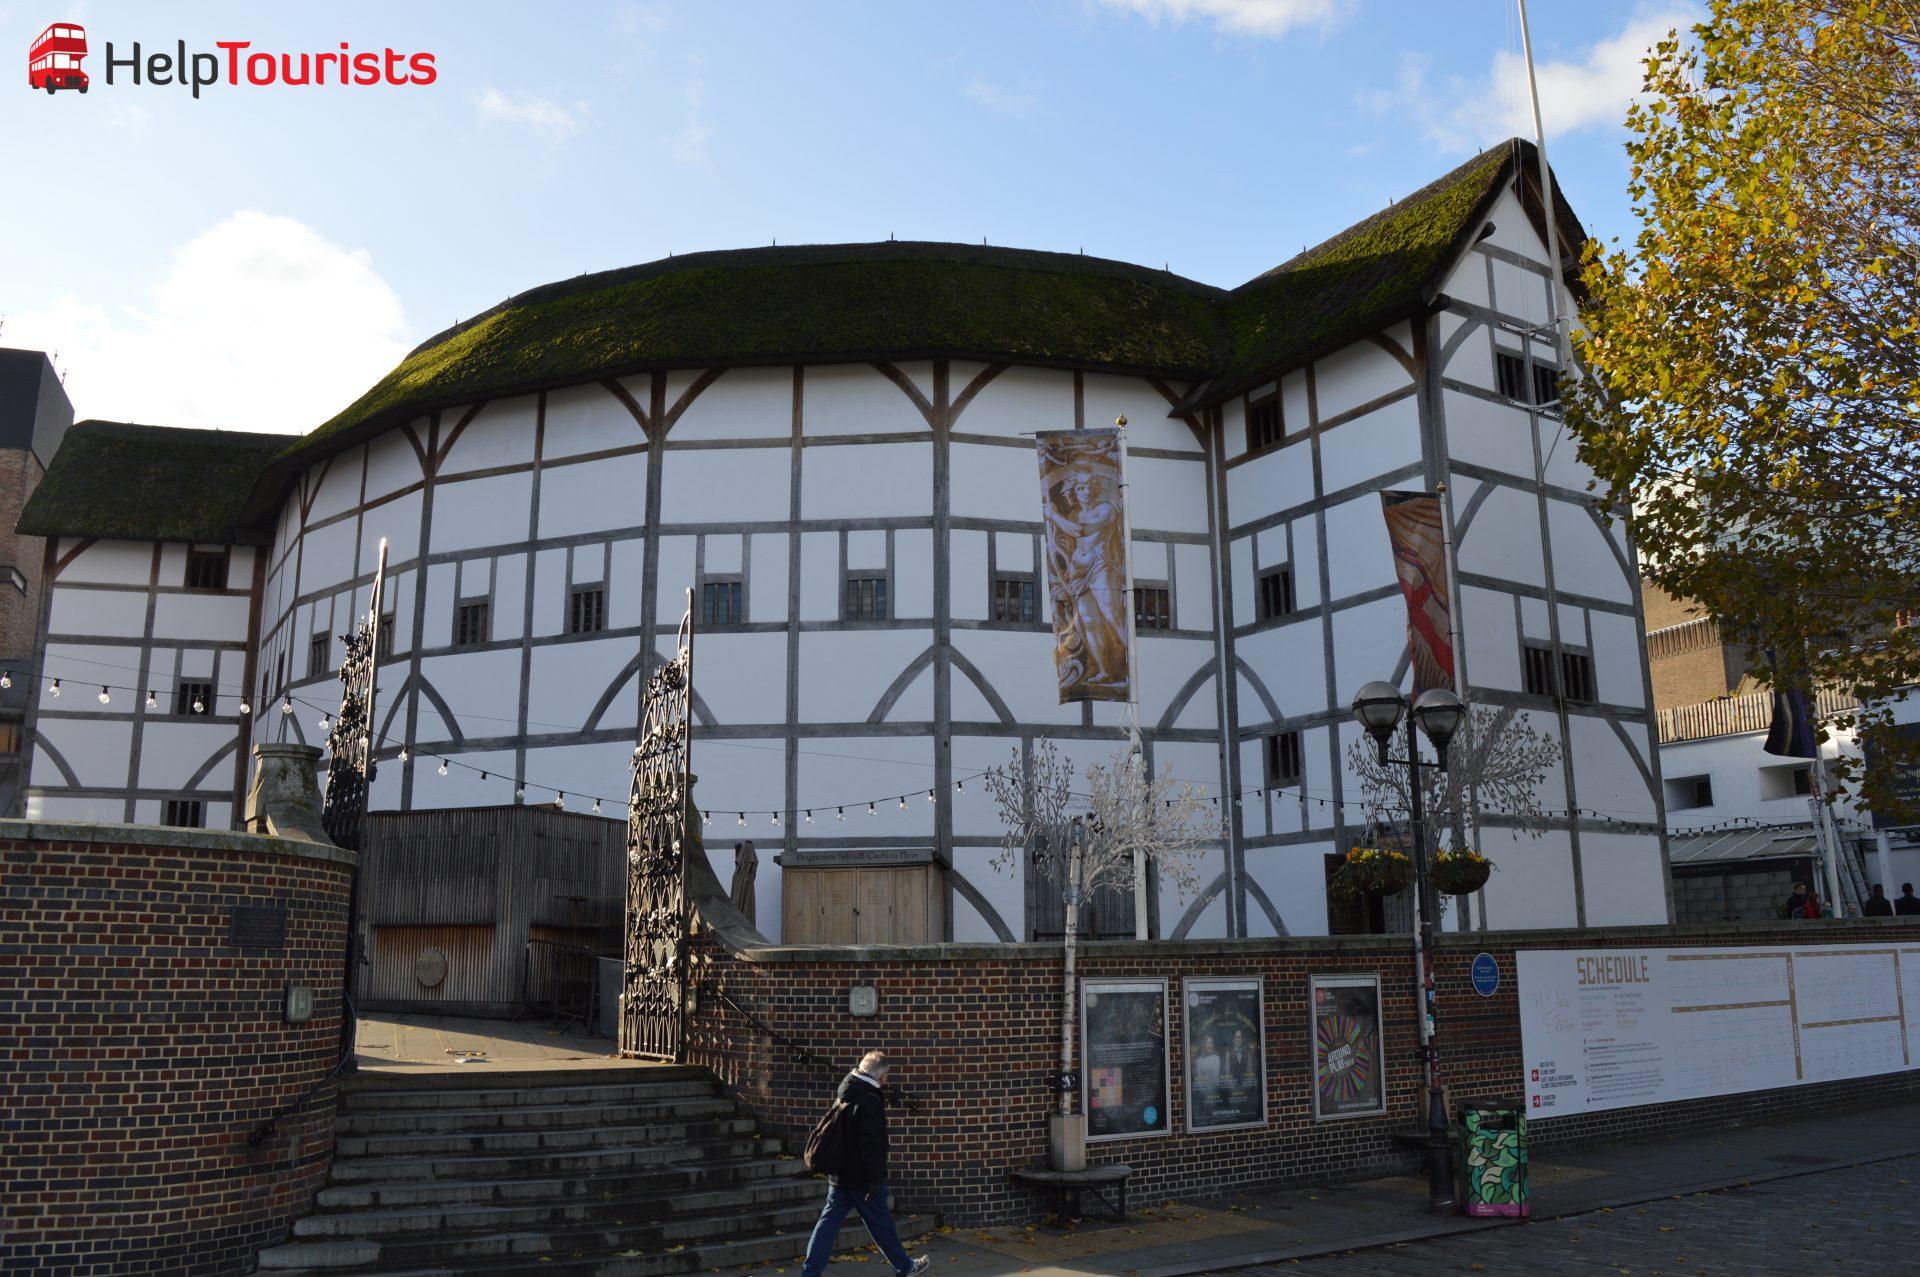 Shakespeare's Globe in London Southwark